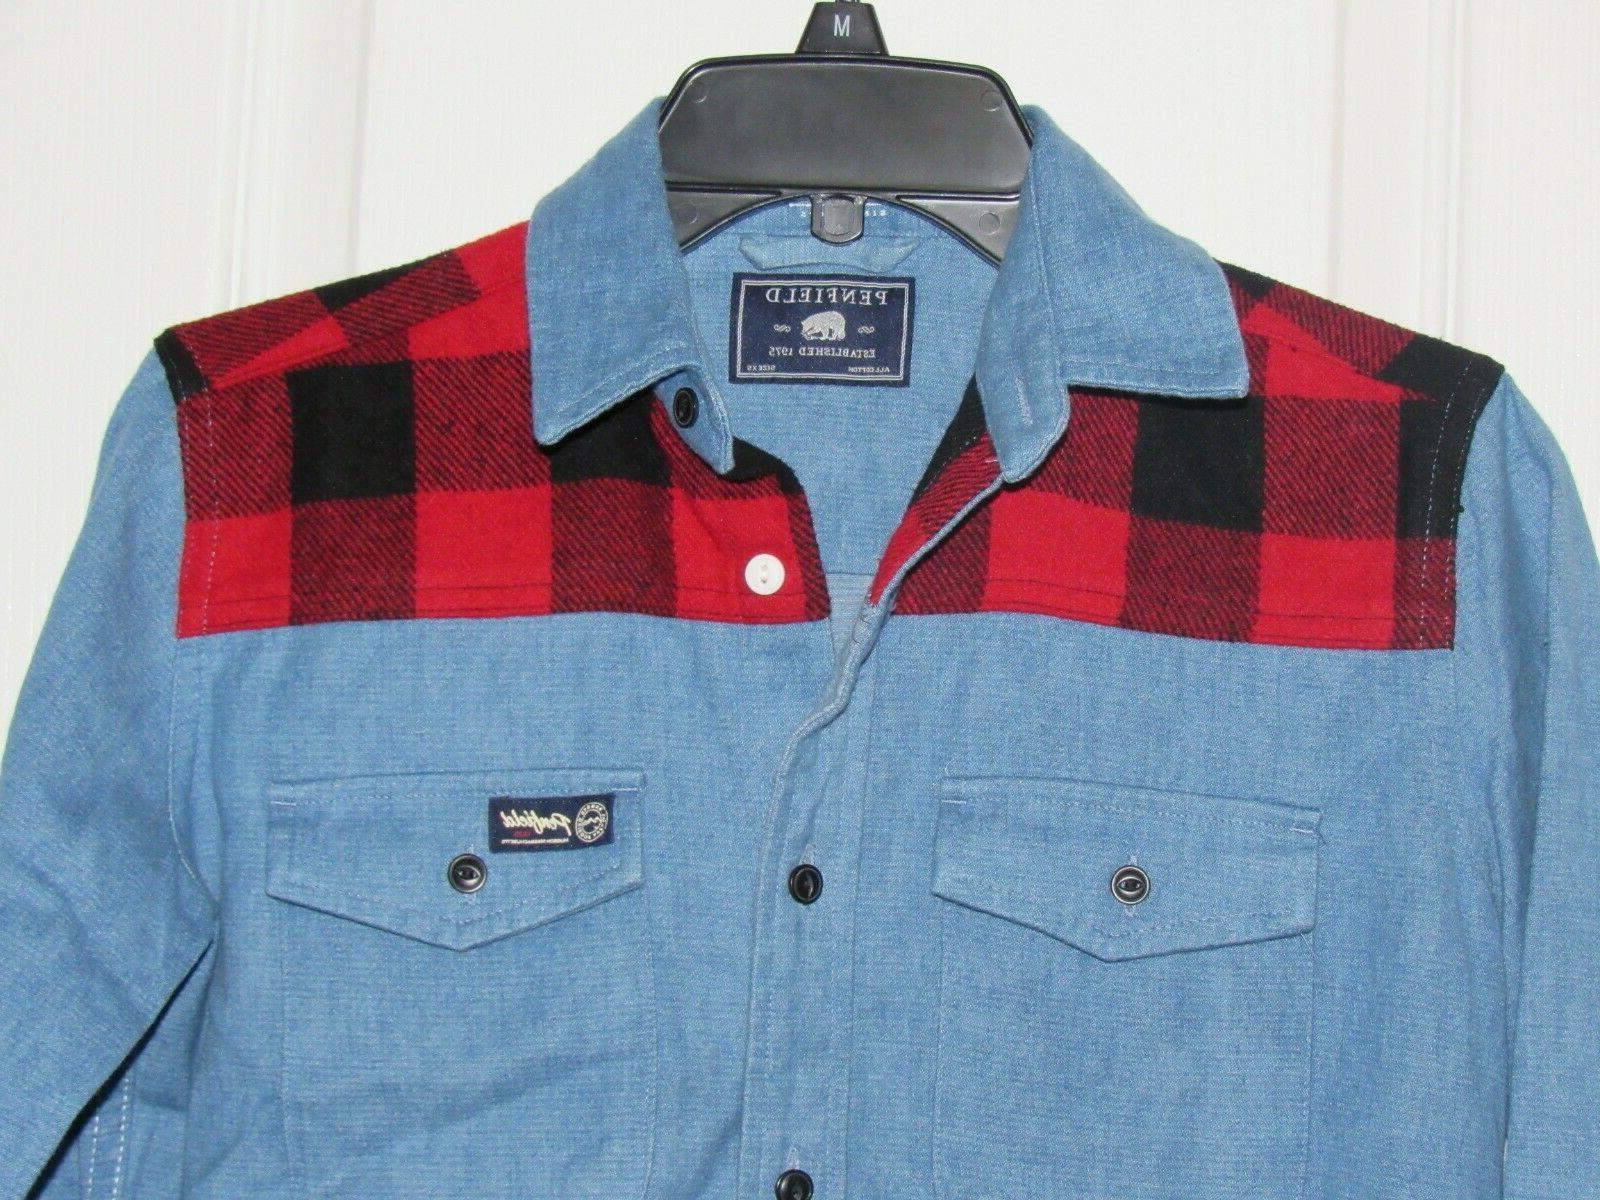 NWOT Denim/Flannel Shirt